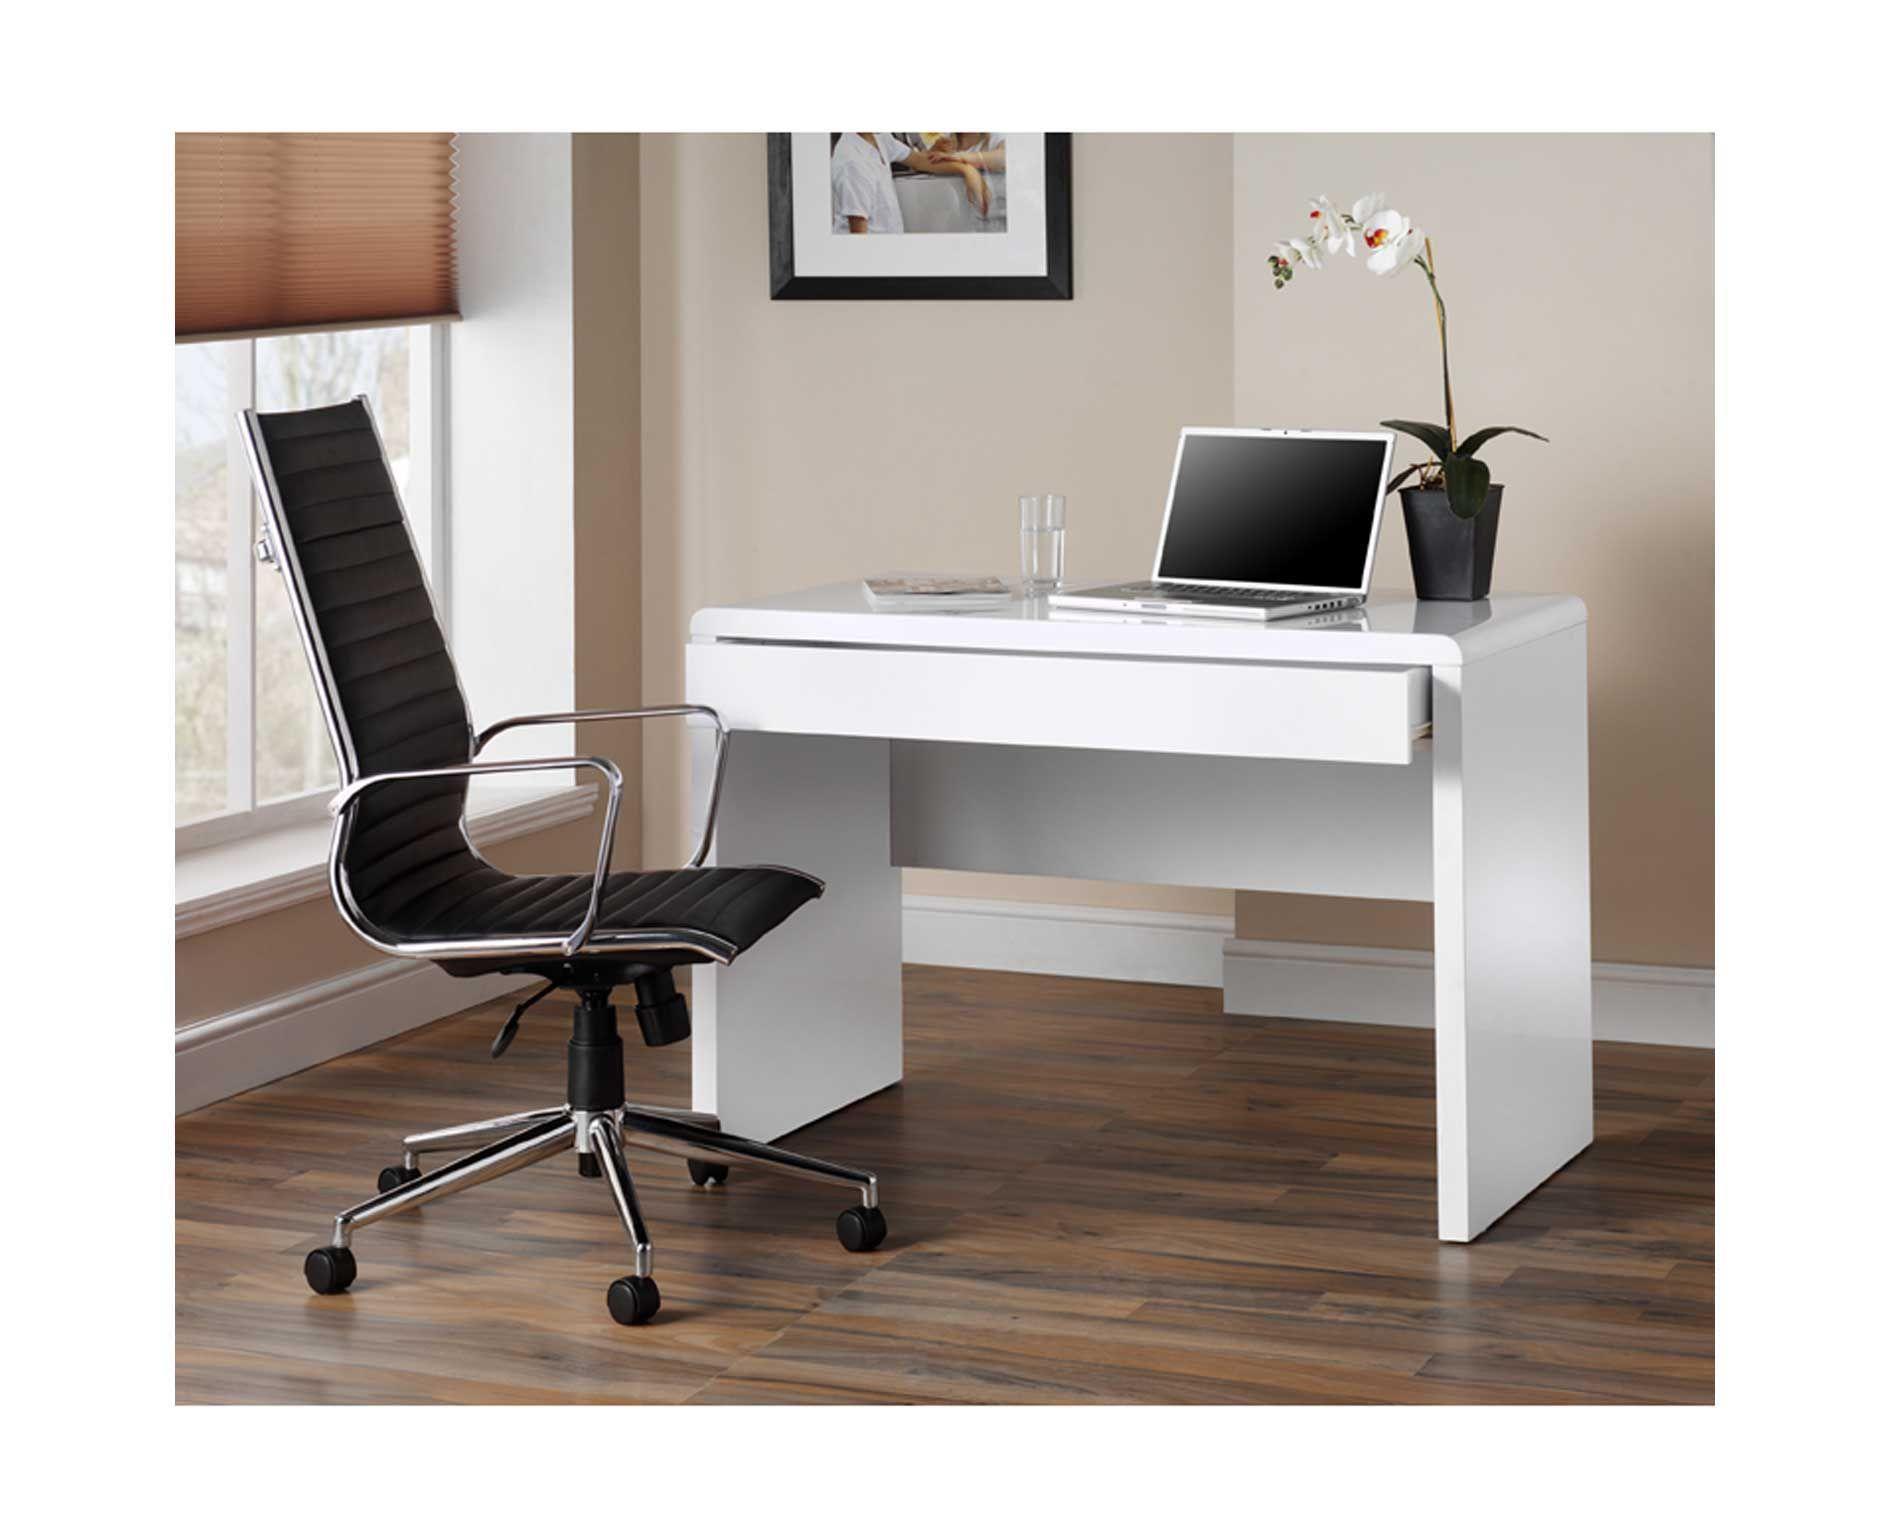 Desks Furniture Storage Ryman Cheap Home Office White Desk Office White Computer Desk